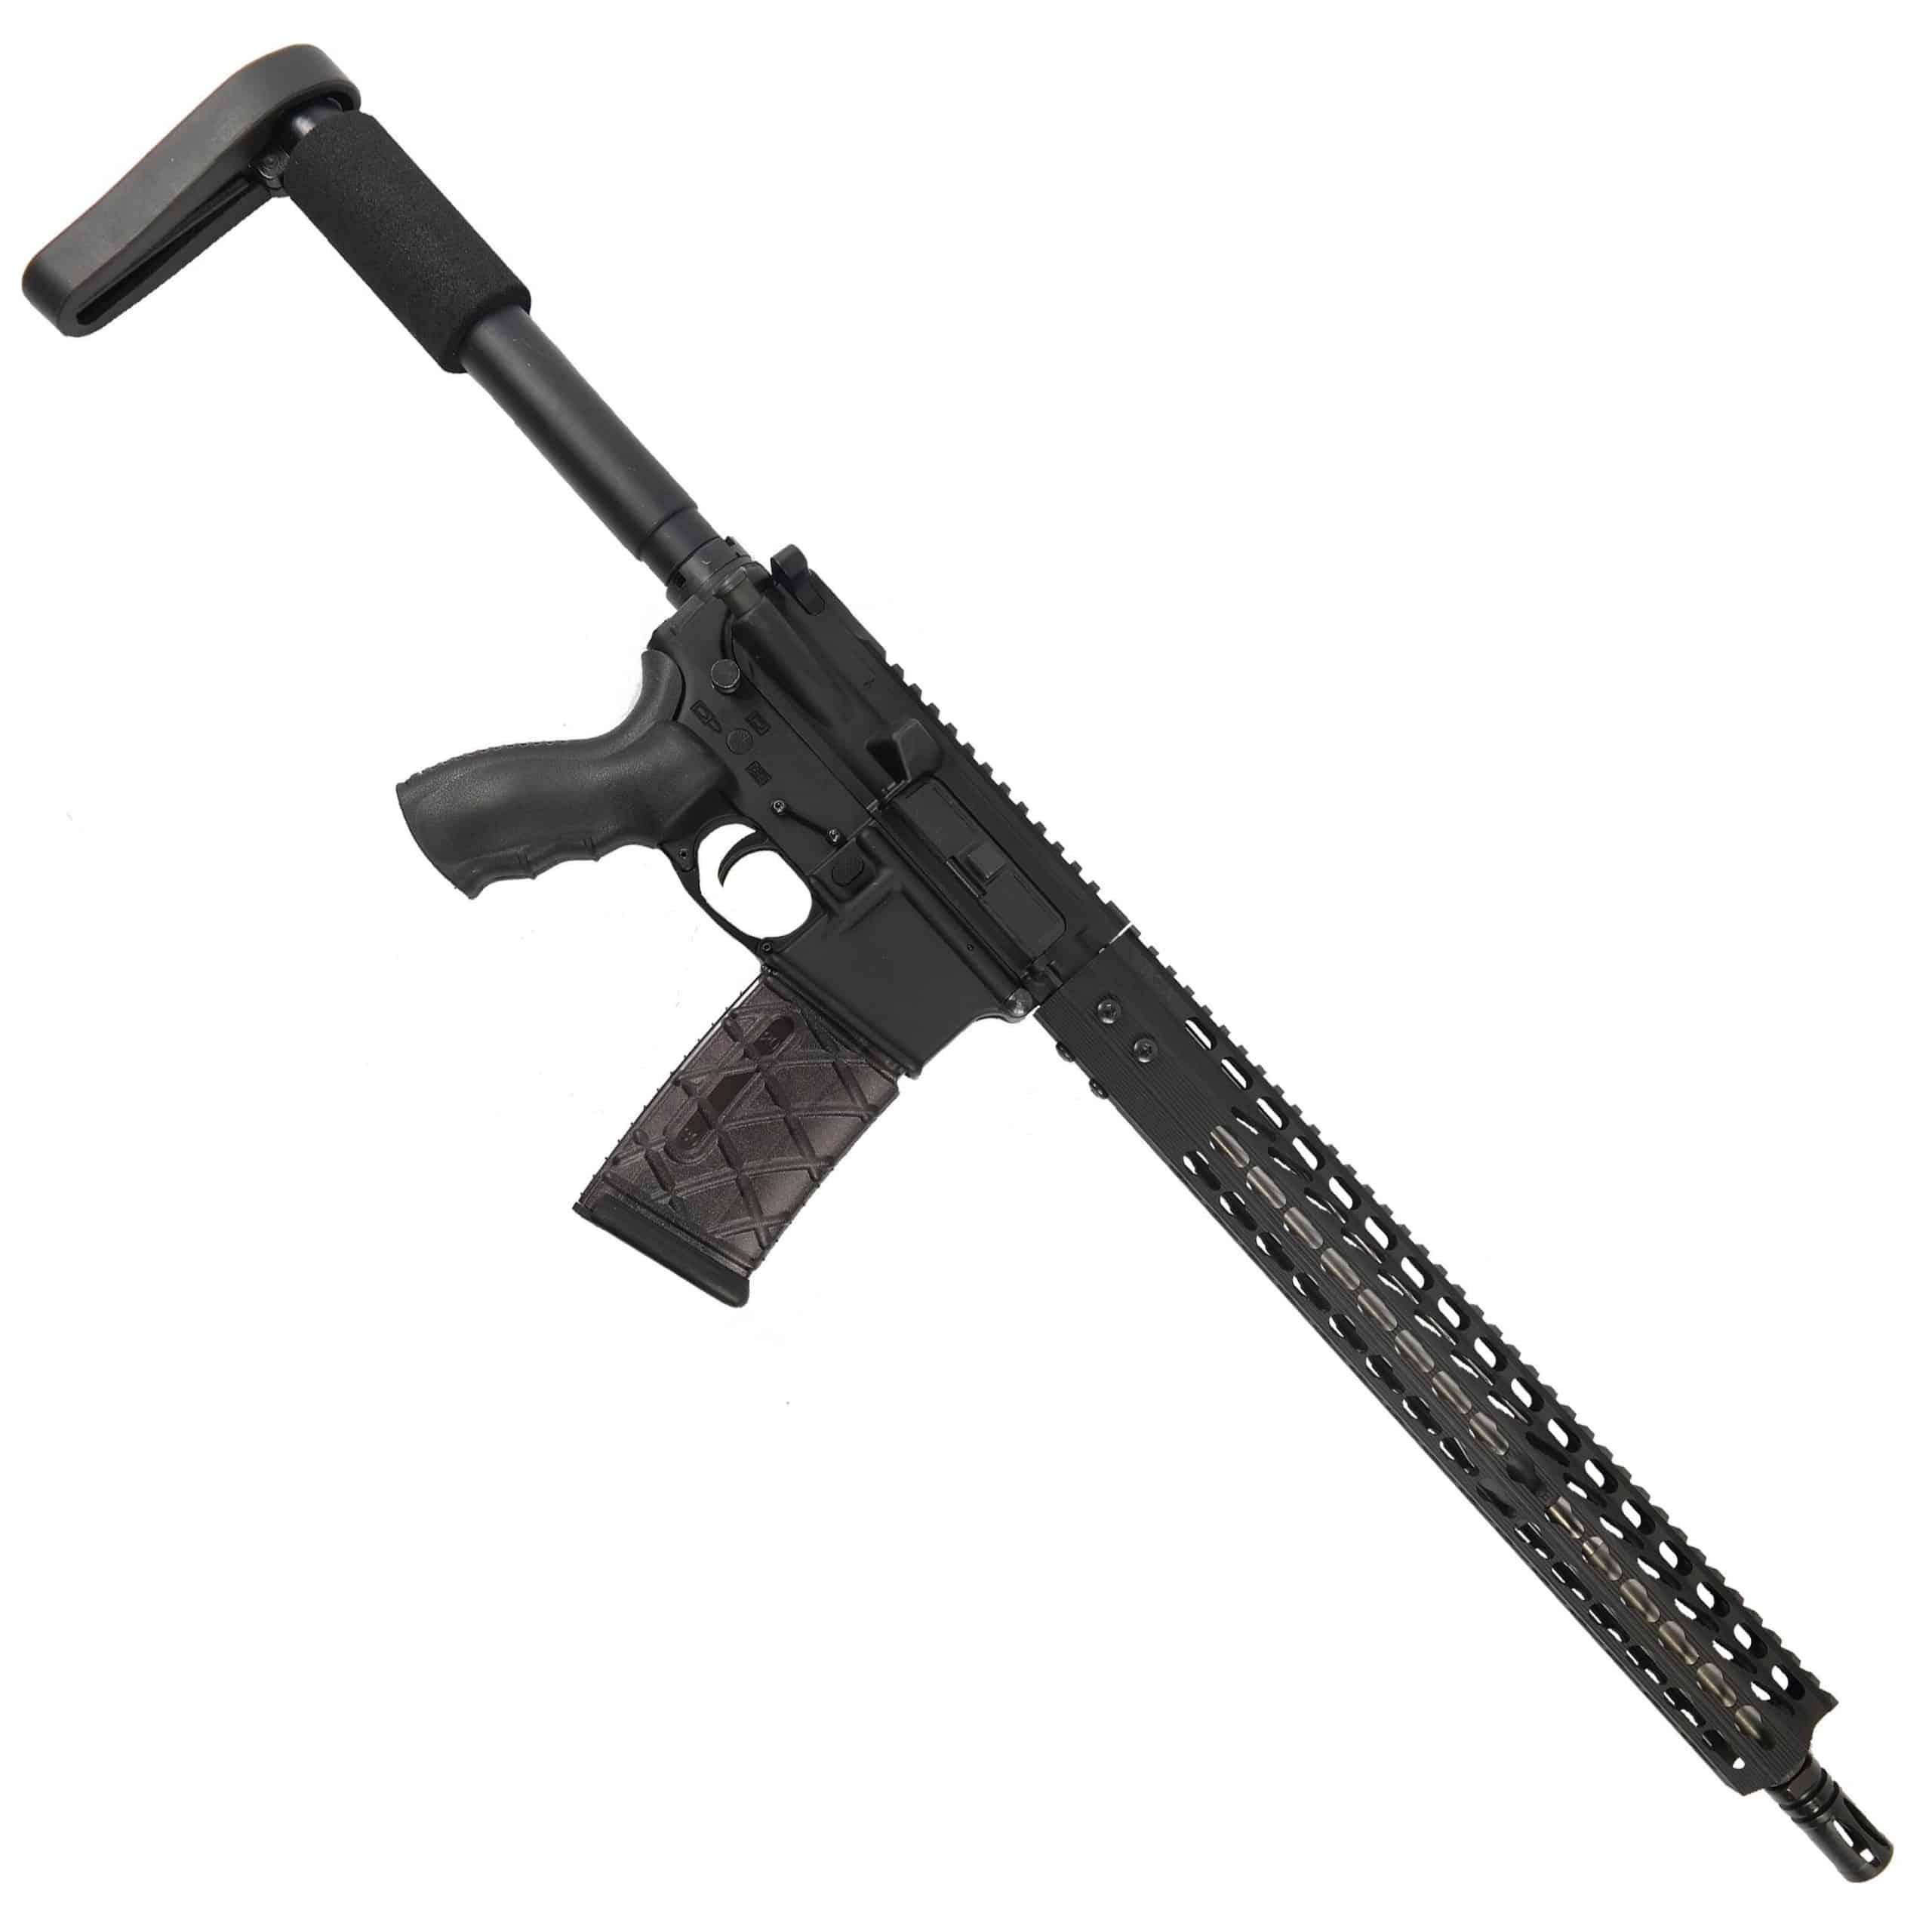 AR-15 5 56 Upper with 15 inch Octagonal Match Grade Barrel